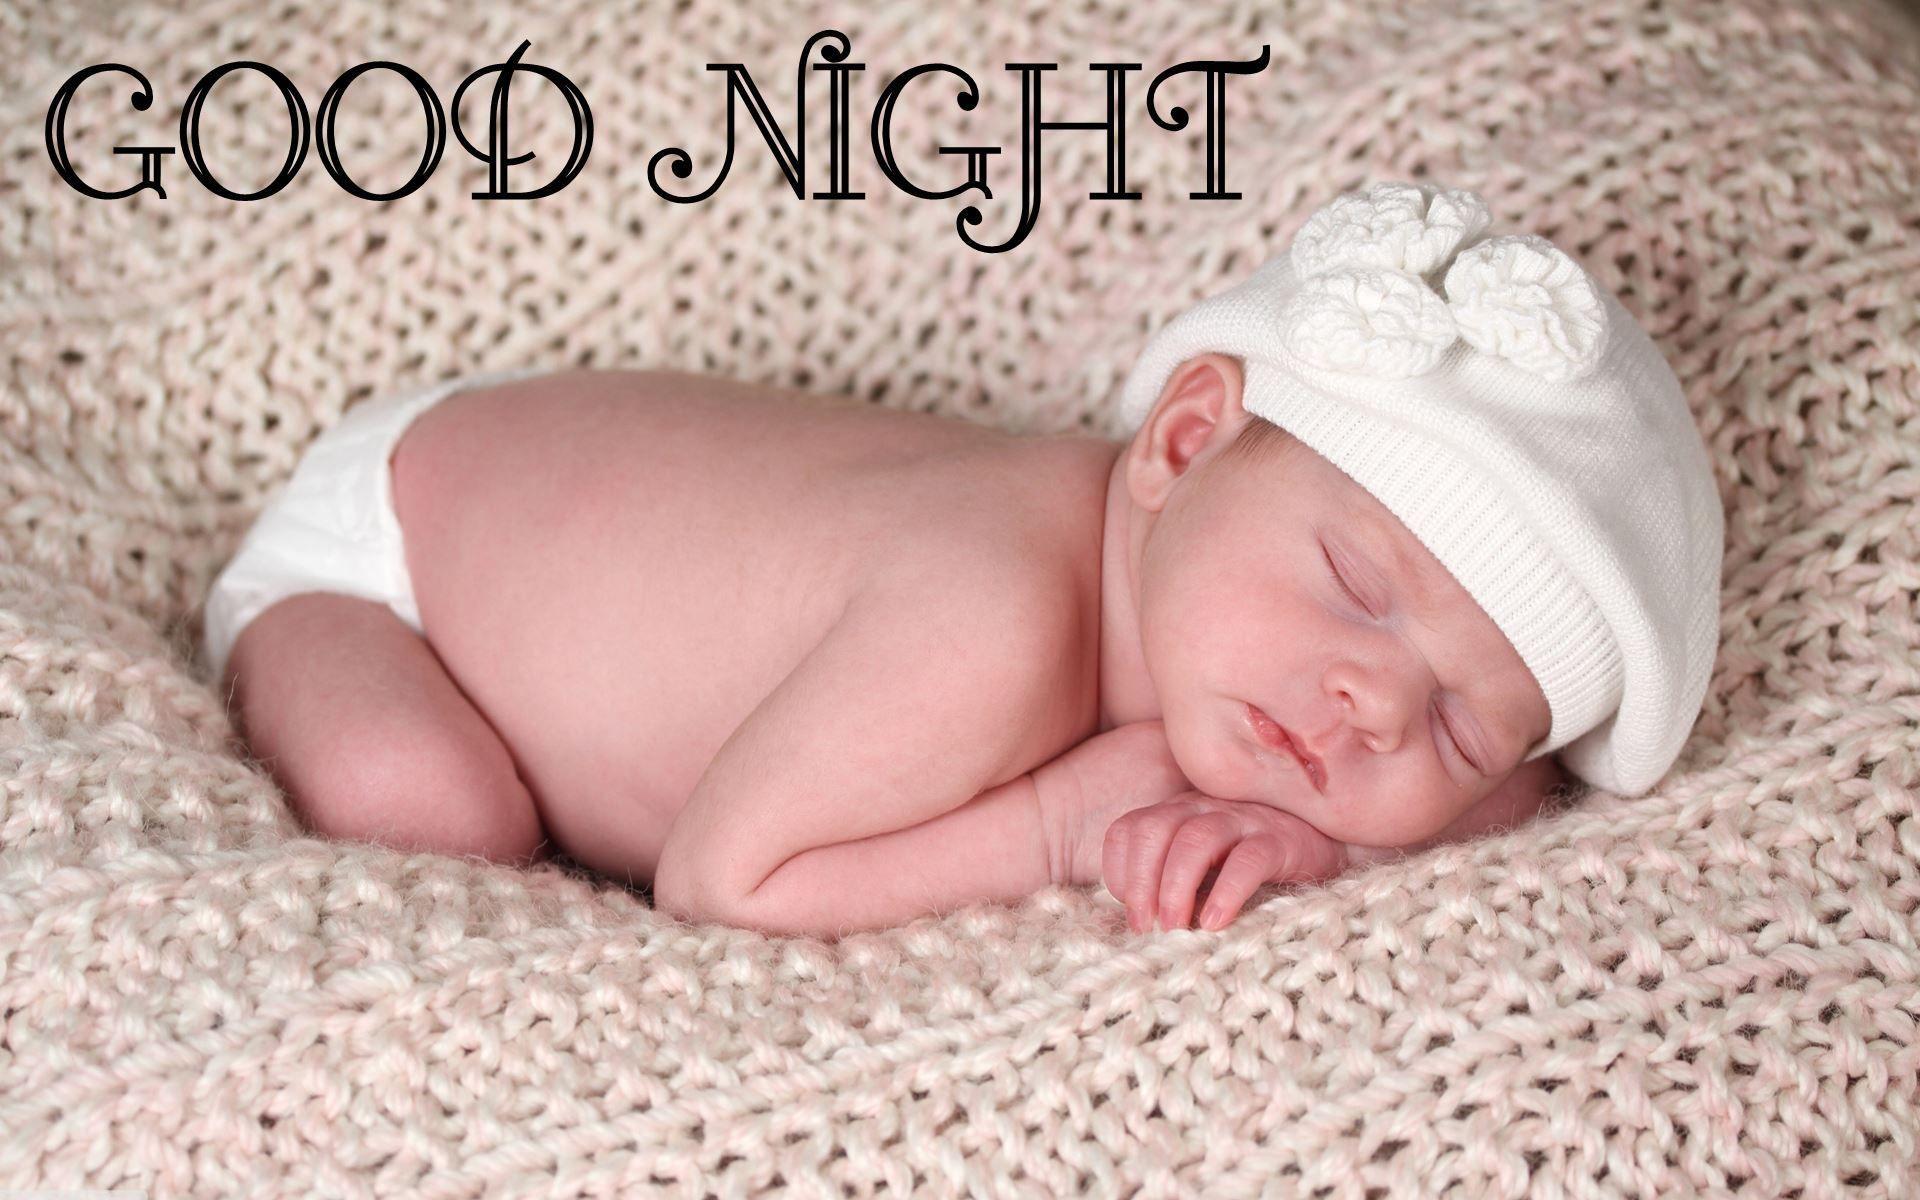 baby boy sleeping good night wallpaper wallpaperspickcom